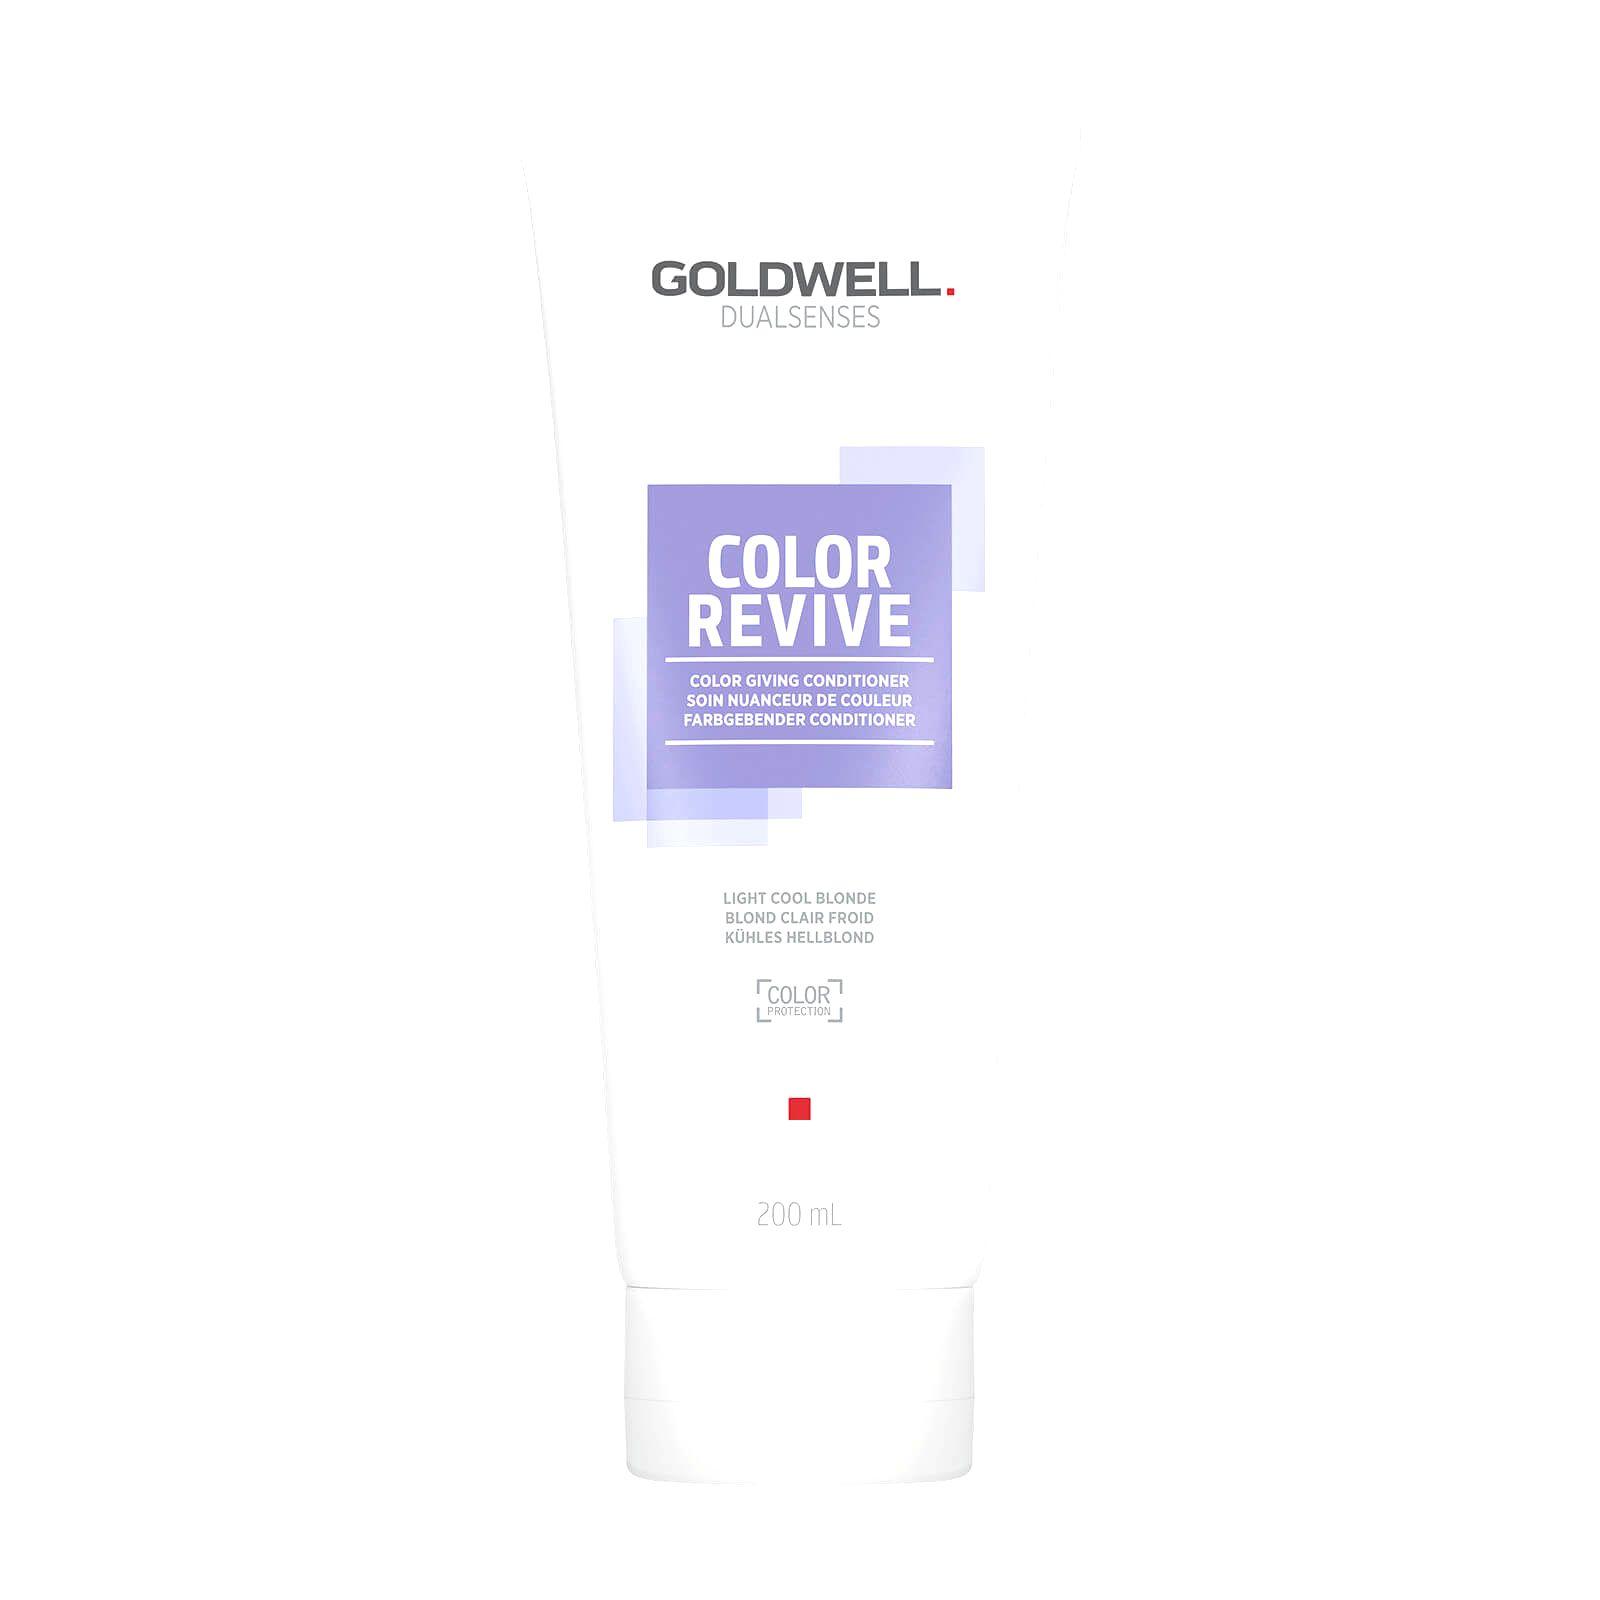 Goldwell Tónovacie kondicionér Light Cool Blonde Dualsenses Color Revive ( Color Giving Condicioner)200 ml